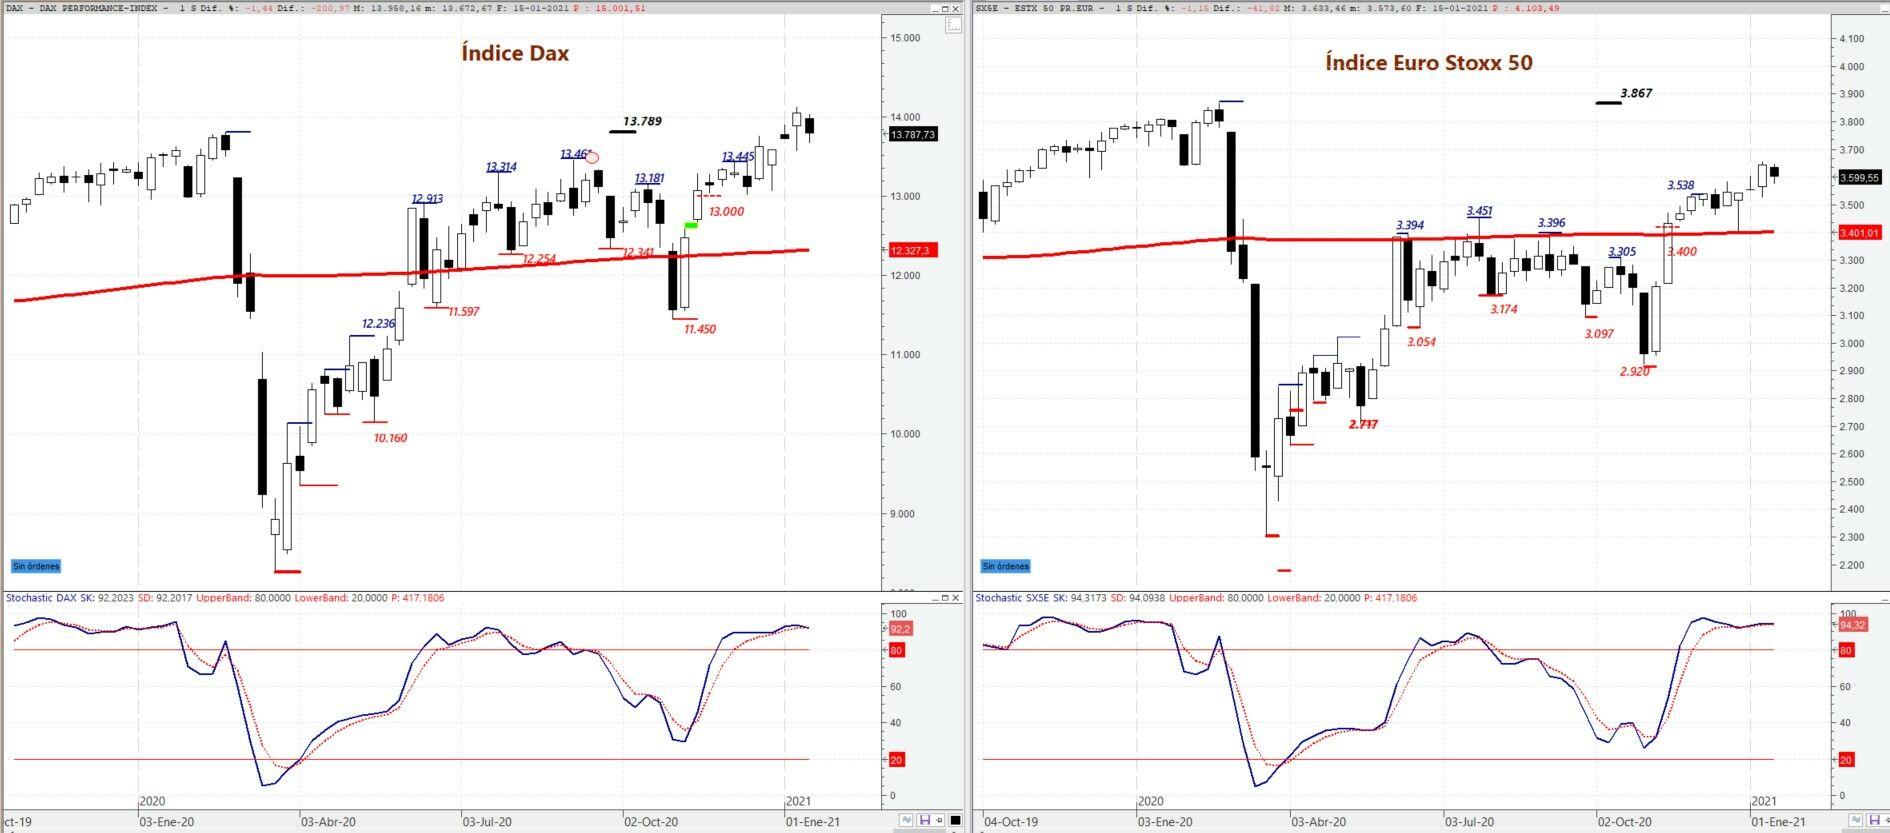 Dax y Euro Stoxx: gráfico técnico